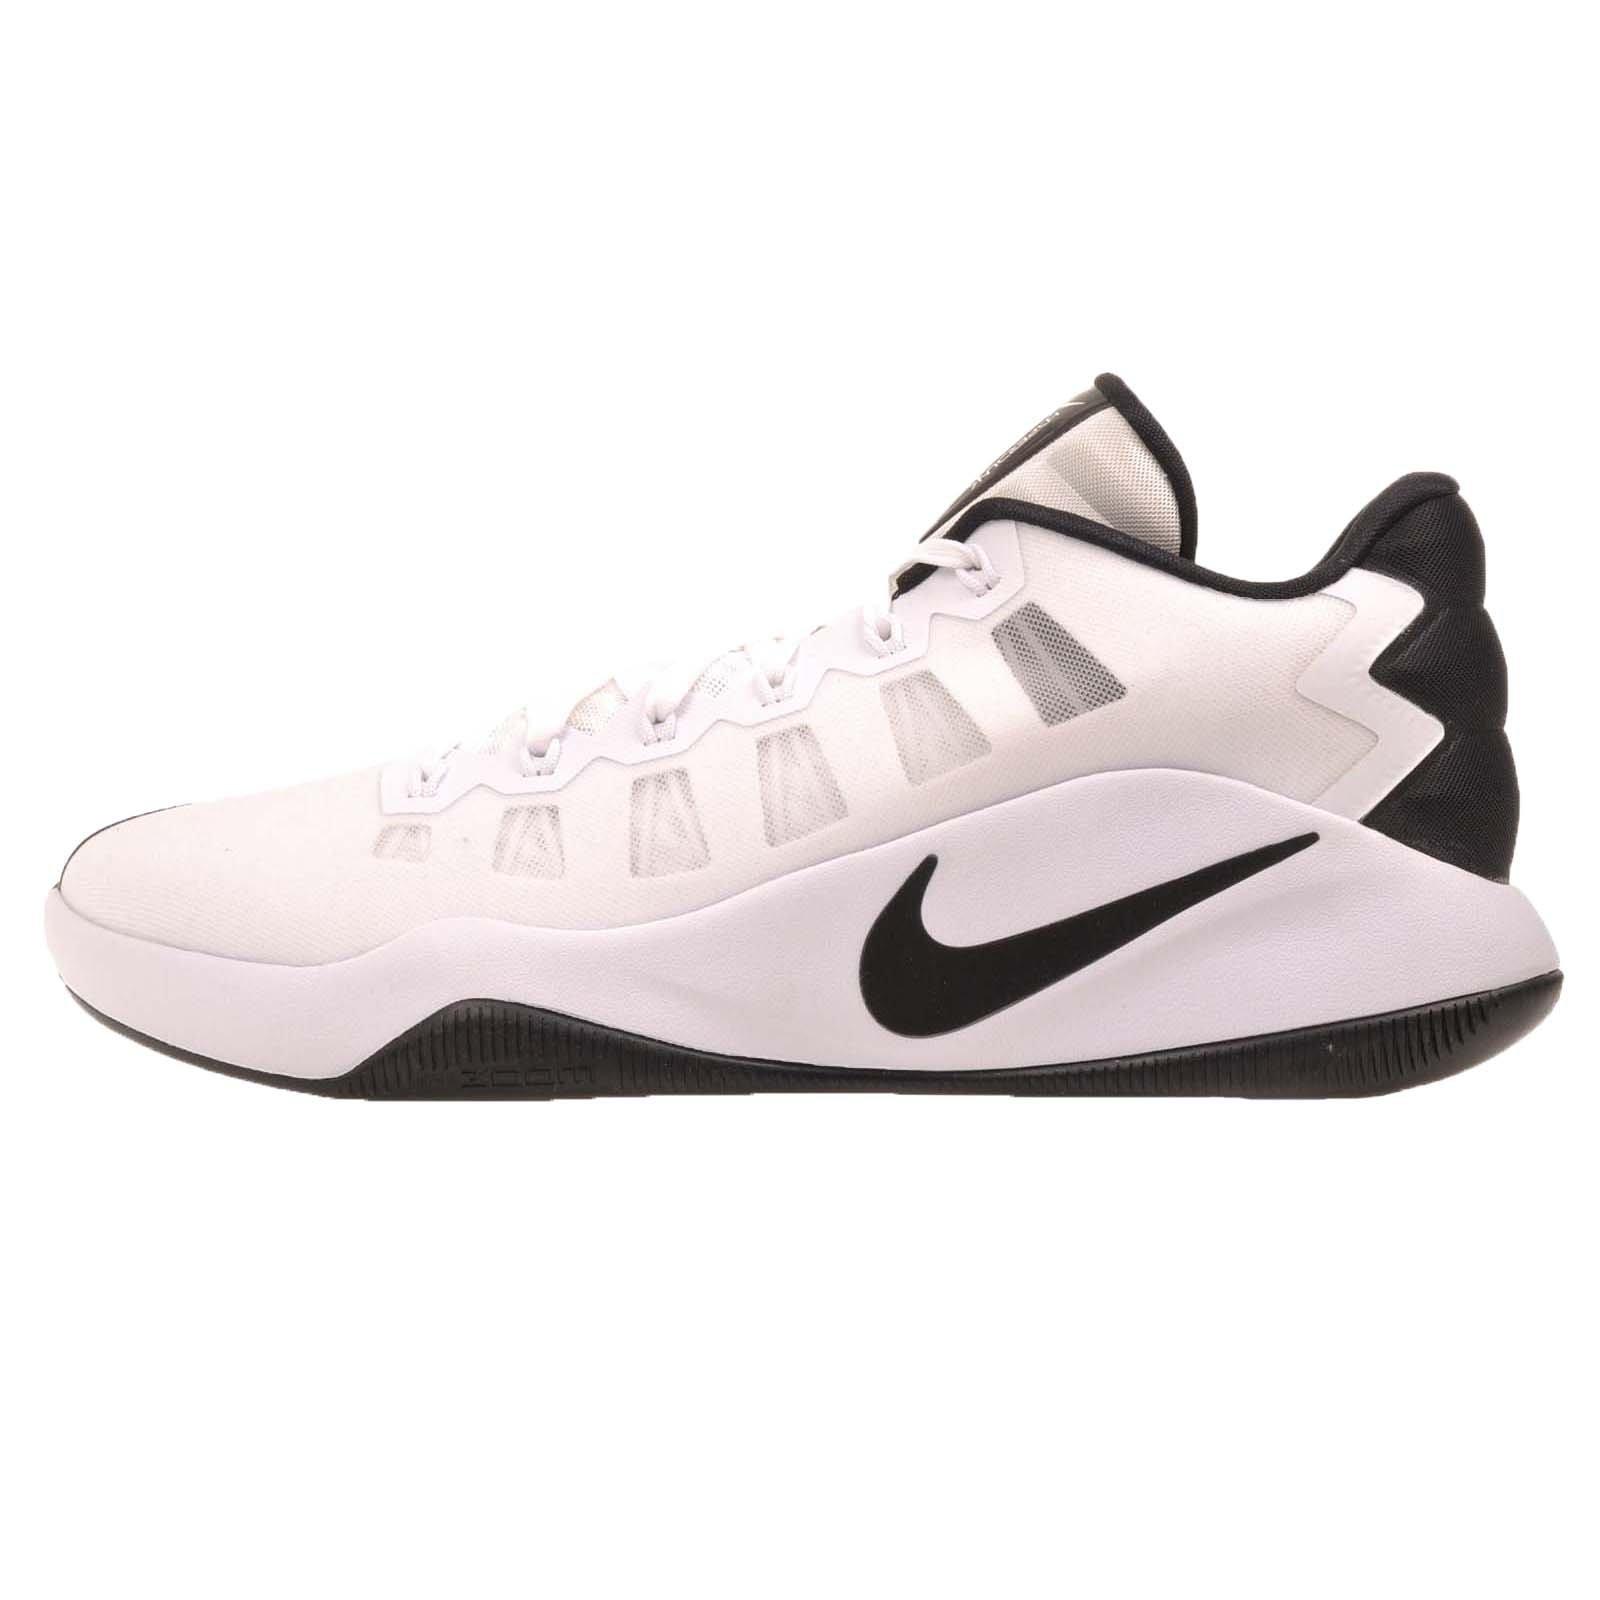 Nike Men's Hyperdunk 2016 Low White/Black